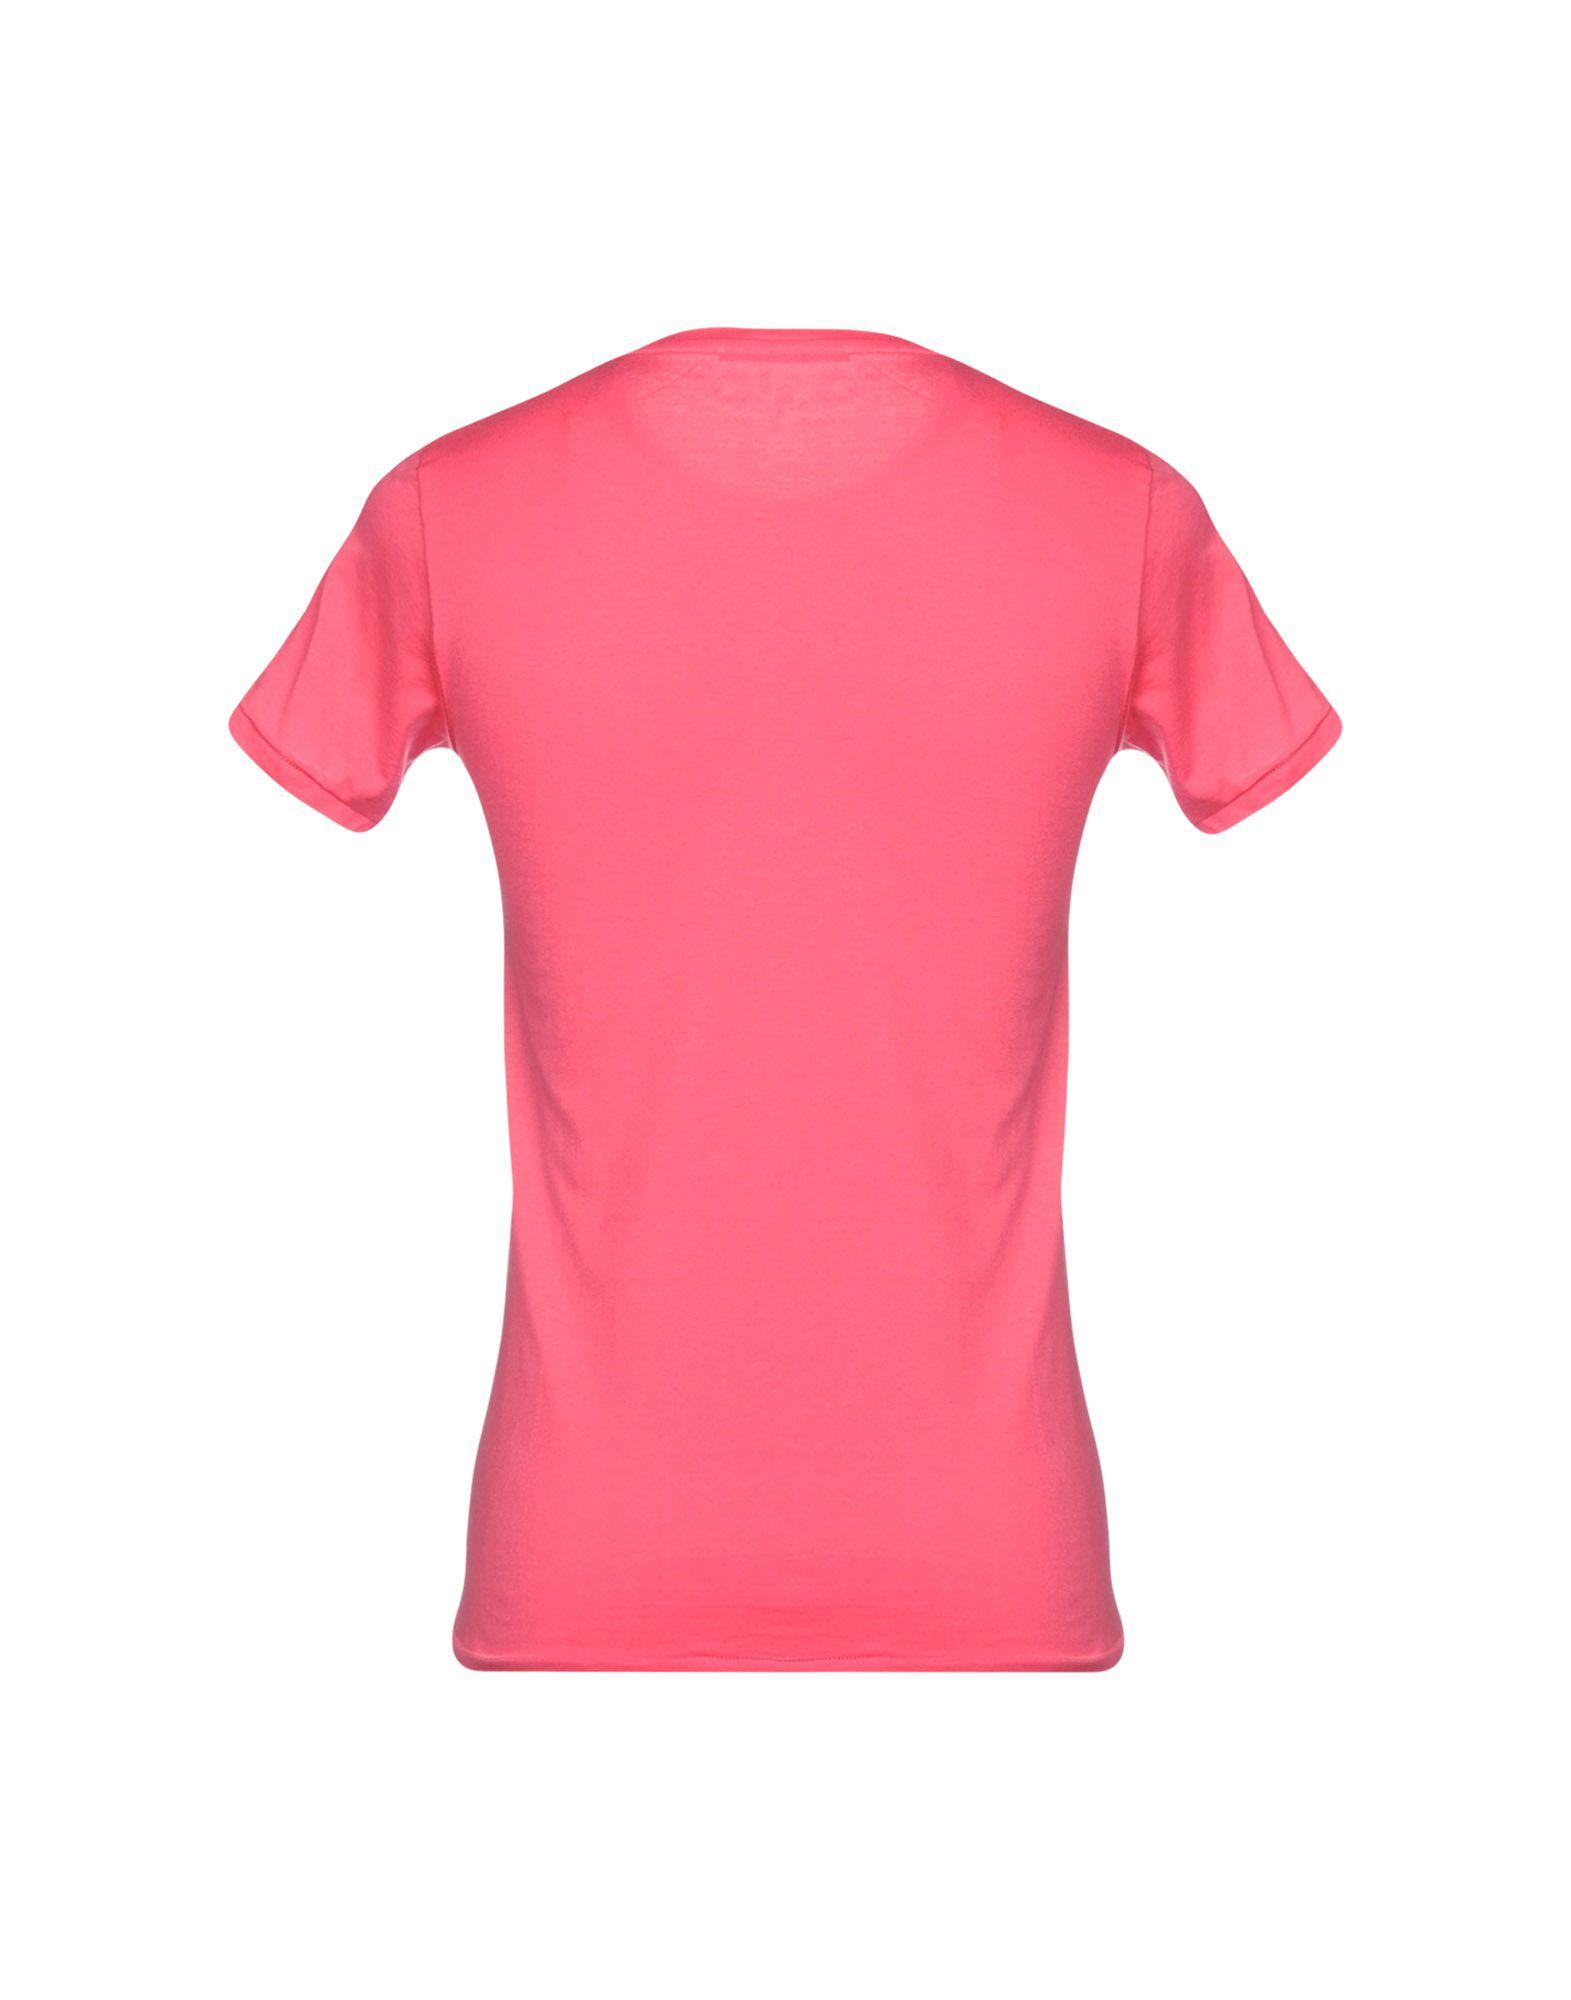 T-Shirt Daniele Alessandrini Uomo 12150226FV - 12150226FV Uomo 7d5924